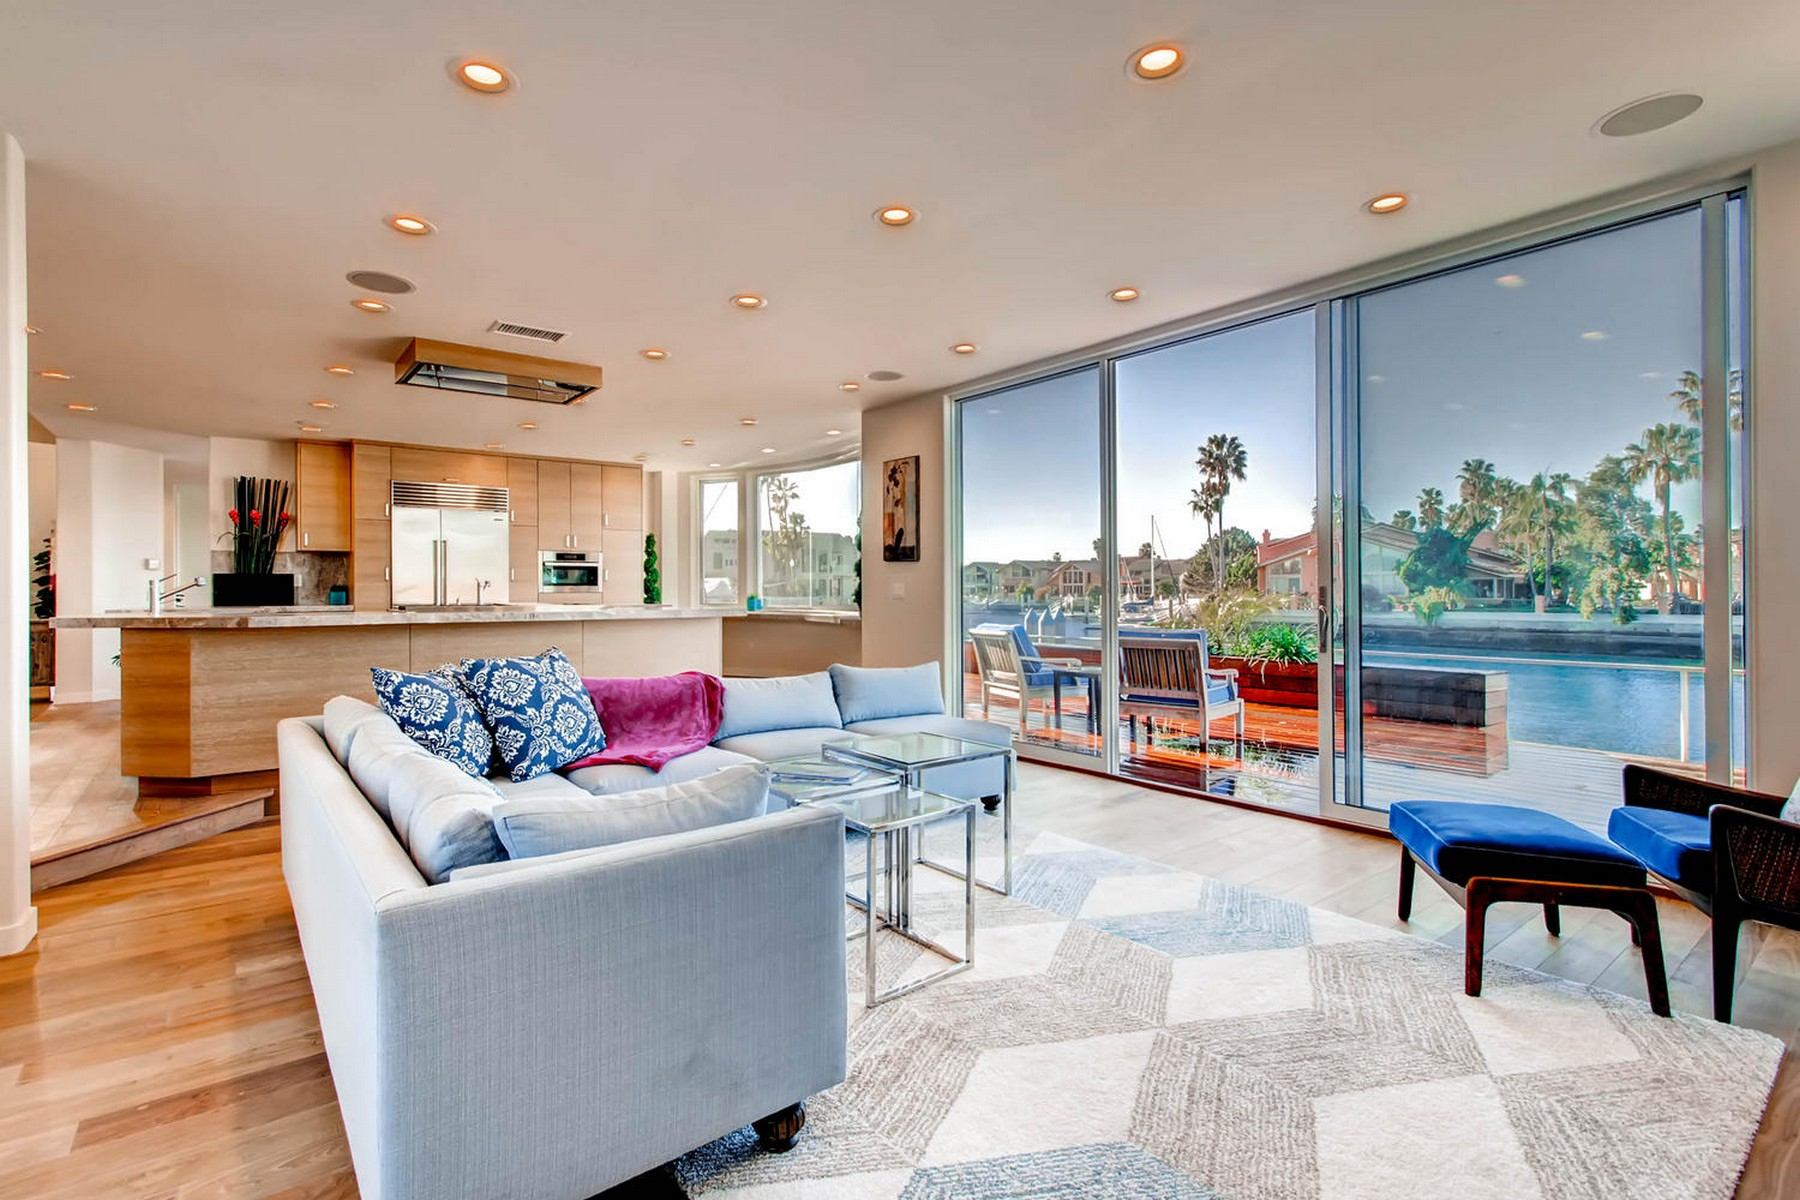 Additional photo for property listing at 4 Spinnaker Way  Coronado, Калифорния 92118 Соединенные Штаты